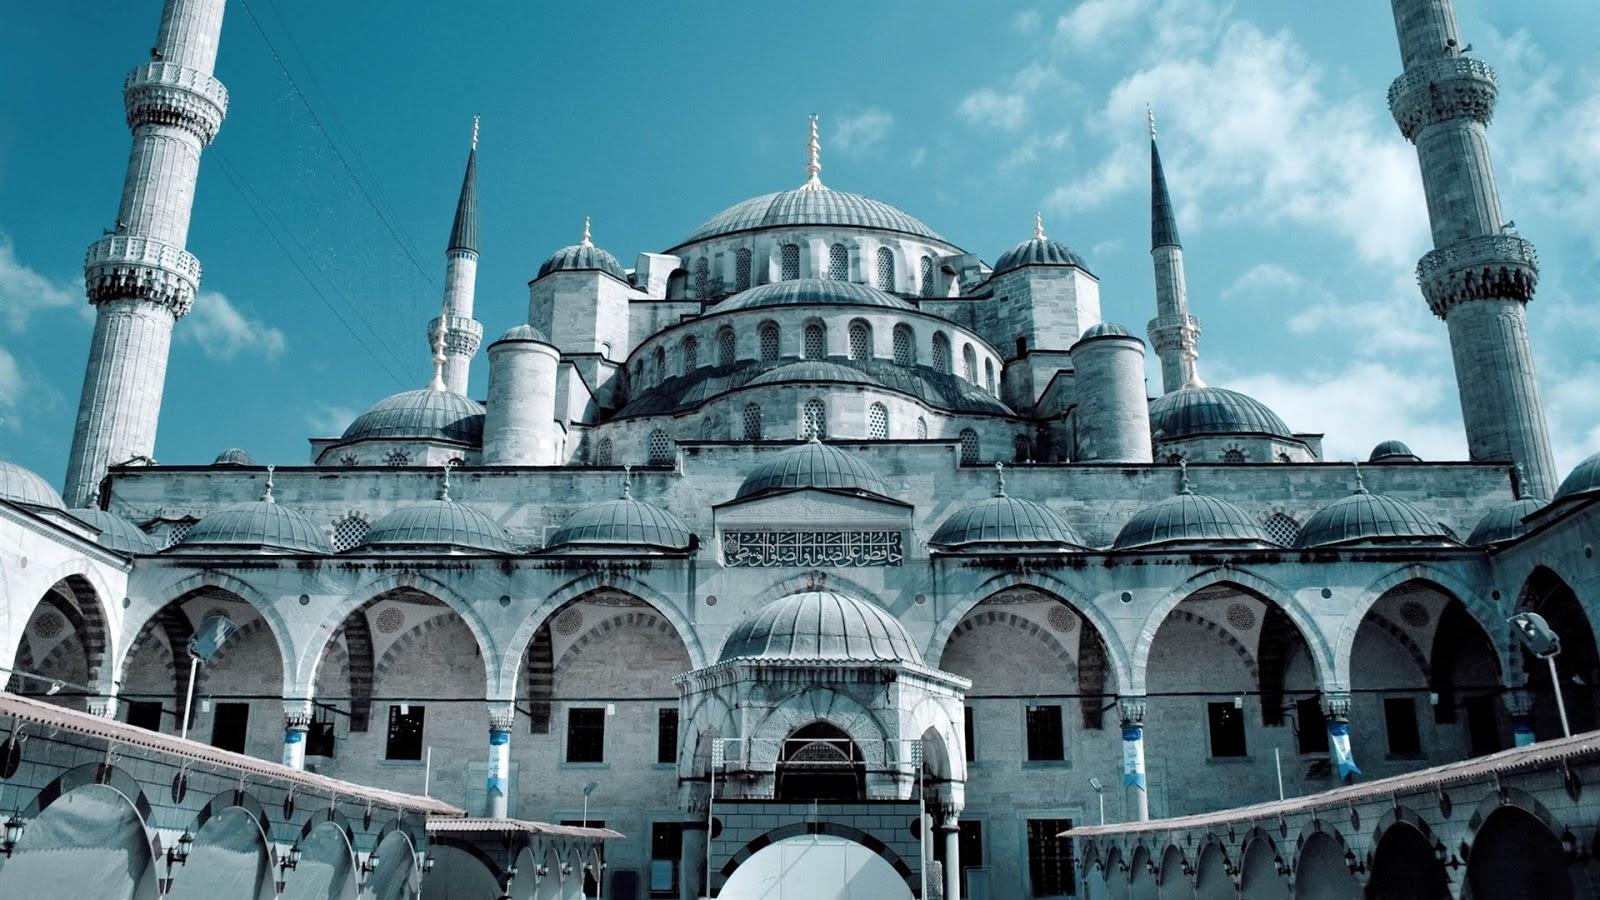 http://1.bp.blogspot.com/-B0IU_-wi3HM/UV6fer4j8iI/AAAAAAAACmo/gZJMIoVtuR8/s1600/hagia_sophia_mosque_istanbul-travel_landscape_Desktop_Wallpapers_1920x1080.jpg